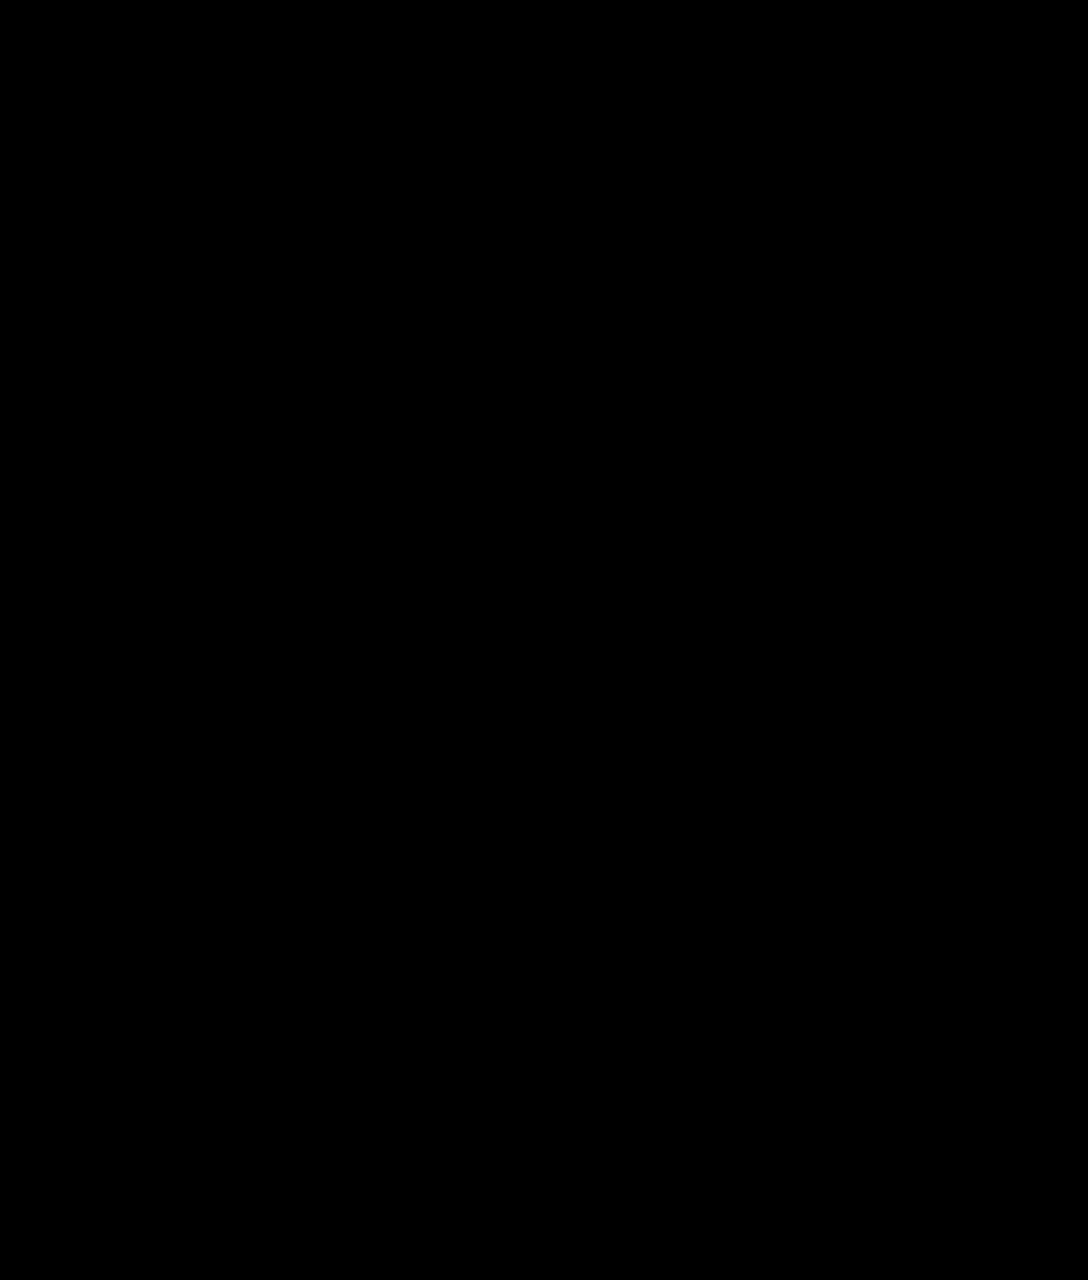 Icone Twitter noir et blanc